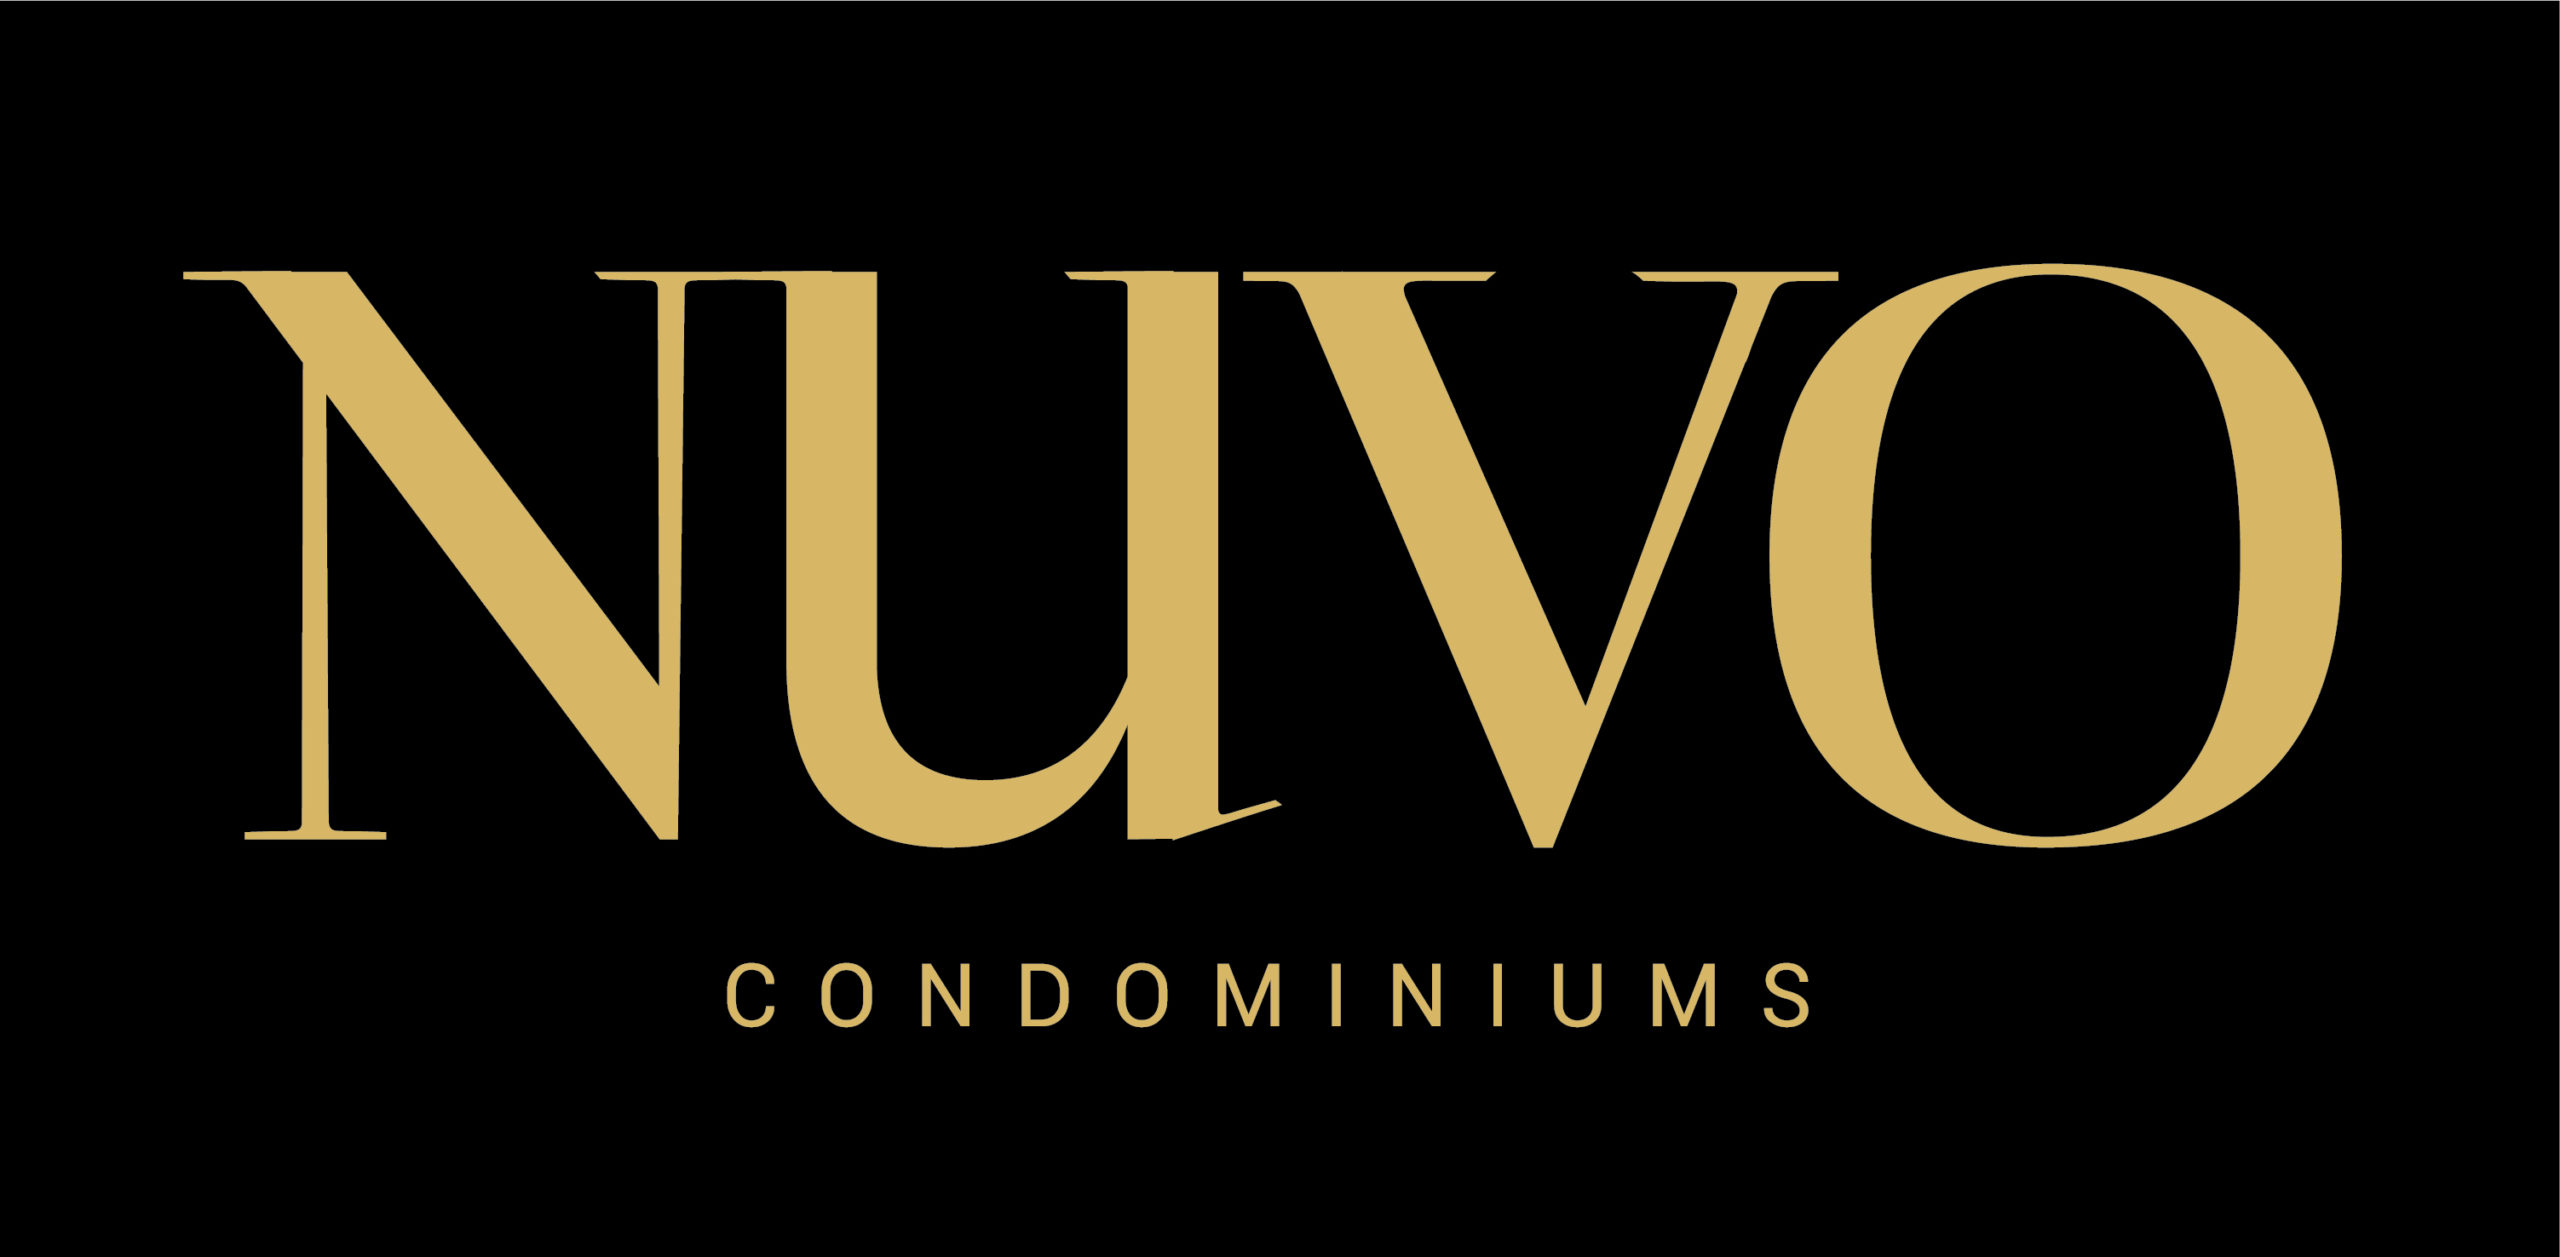 NUVO Condominiums